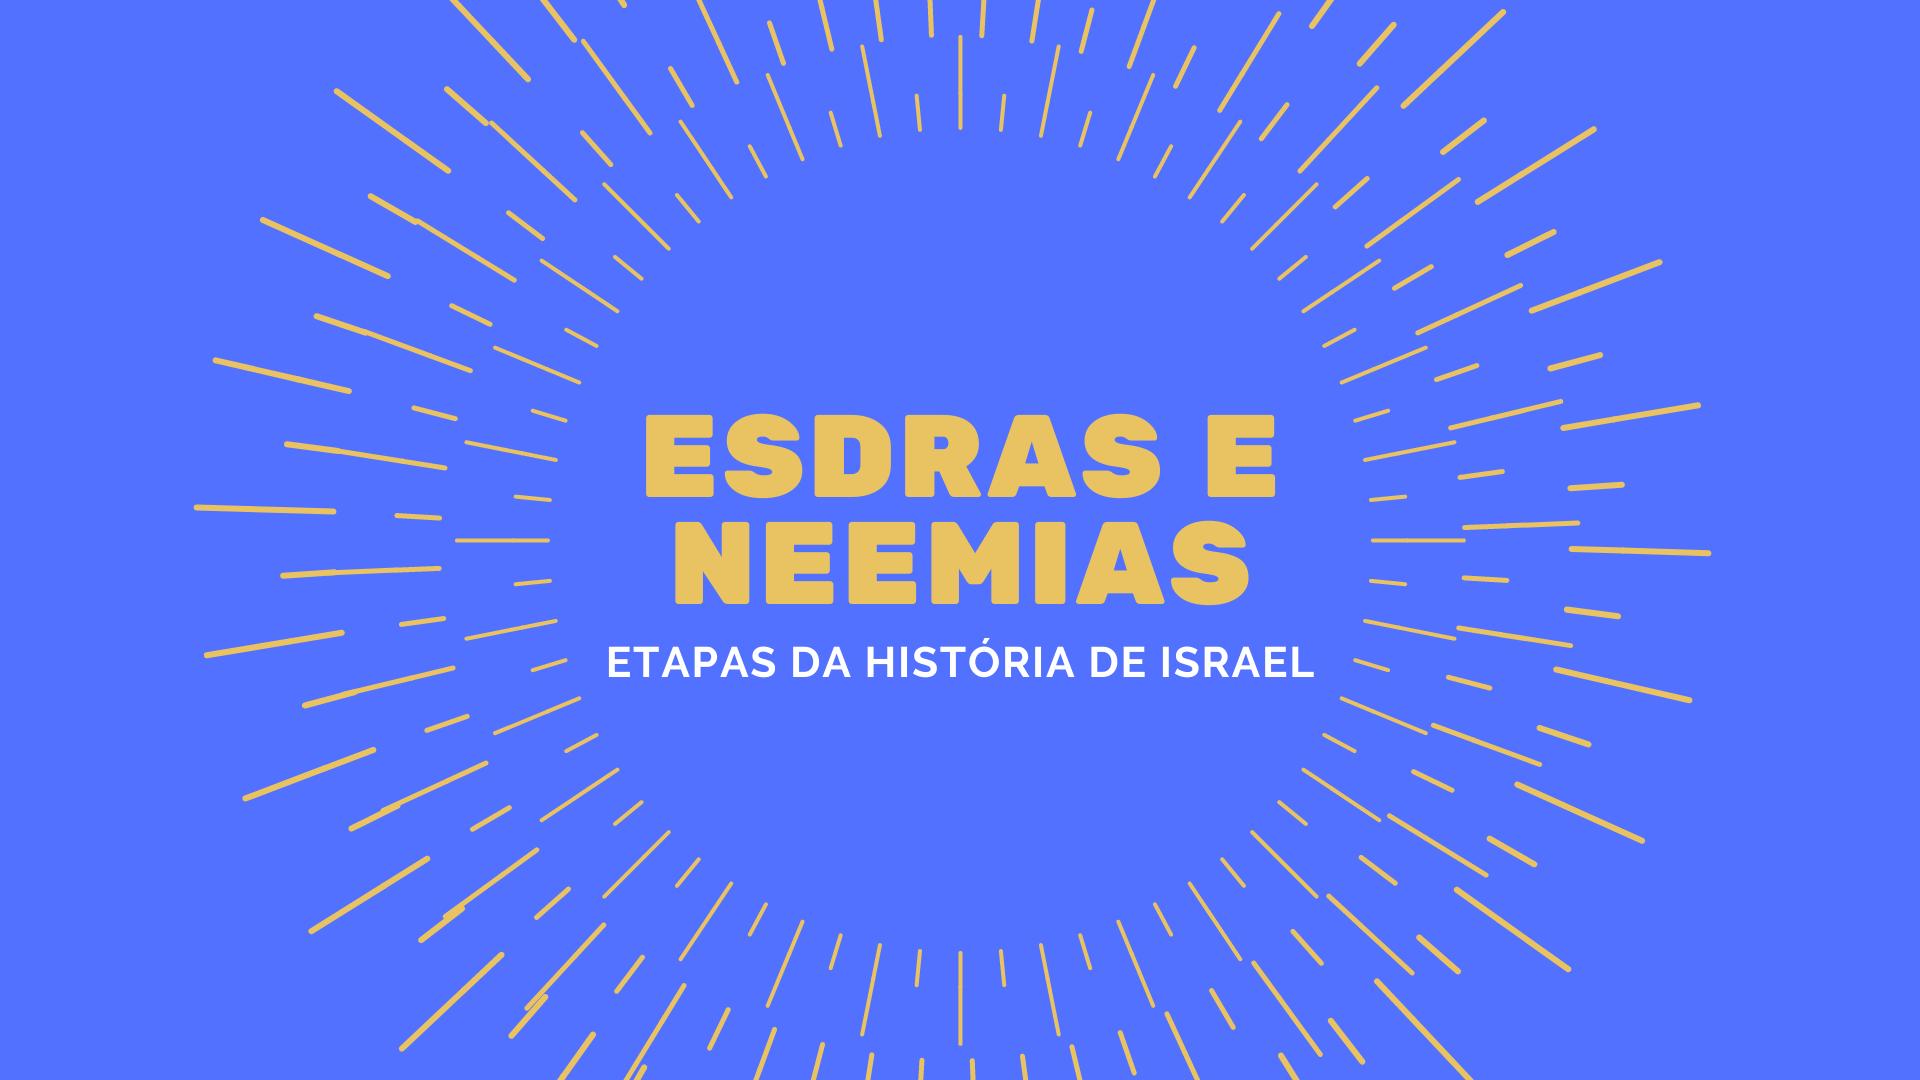 esdras e neemias amarelo e branco | Apostolado Litúrgico Brasil